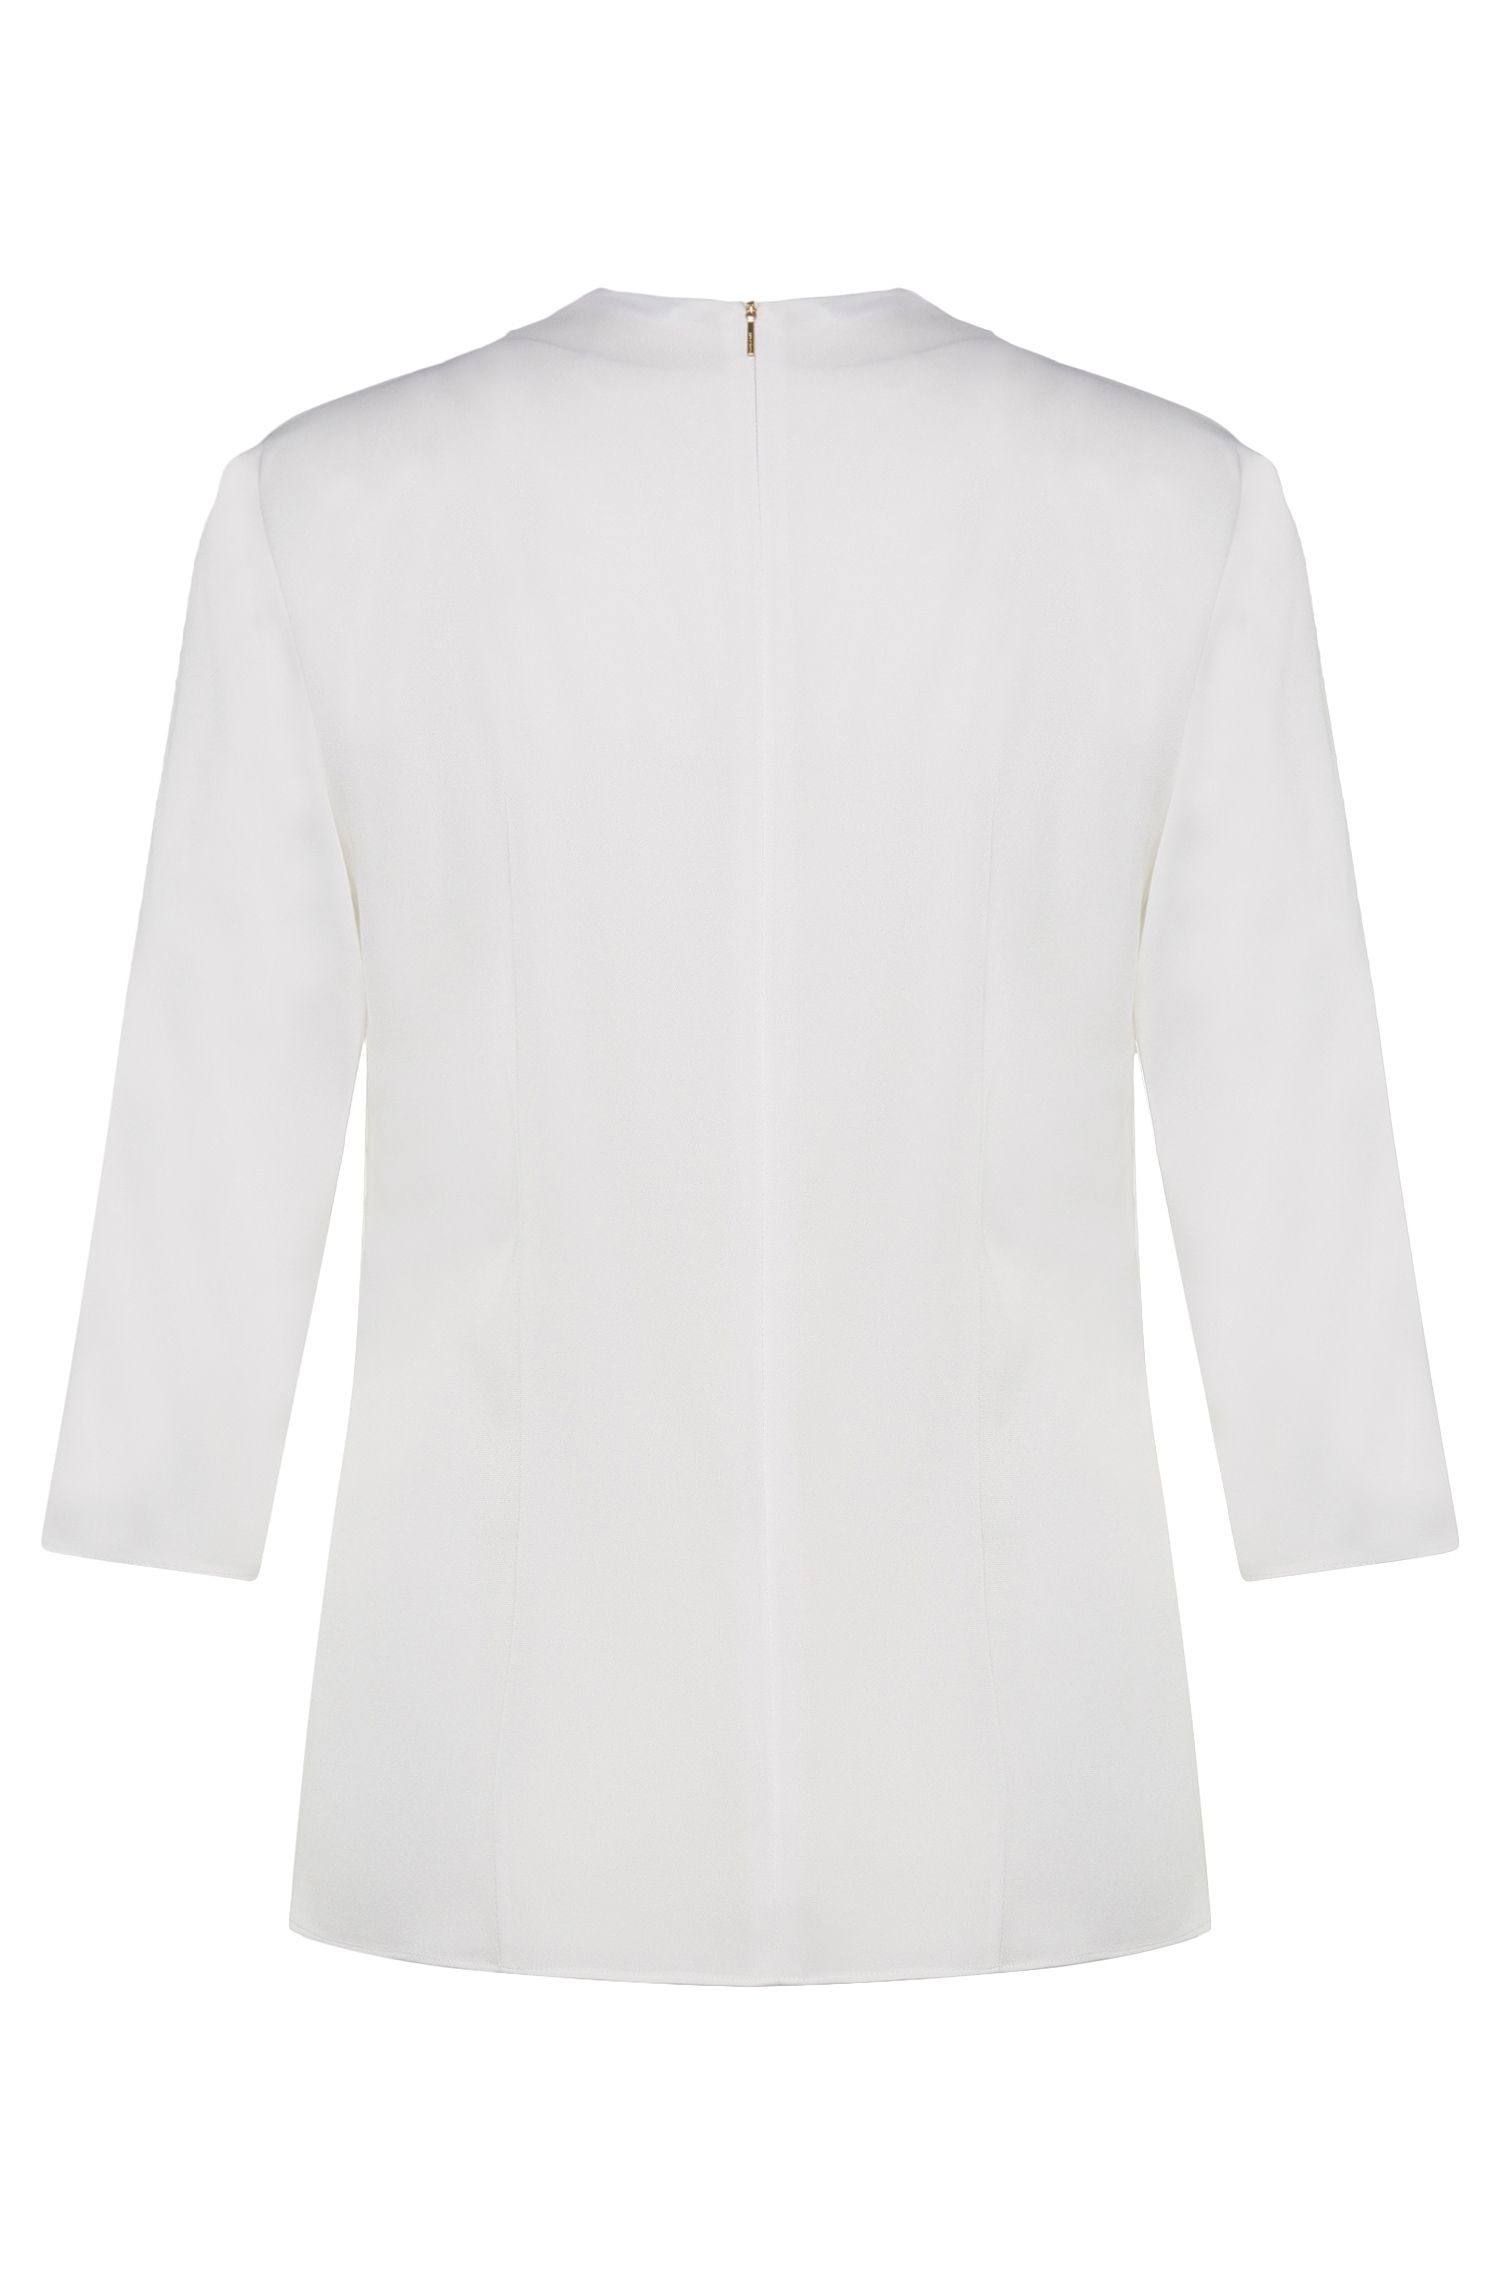 Unifarbene Bluse aus Stretch-Seide mit Blende: 'Ikarsi'